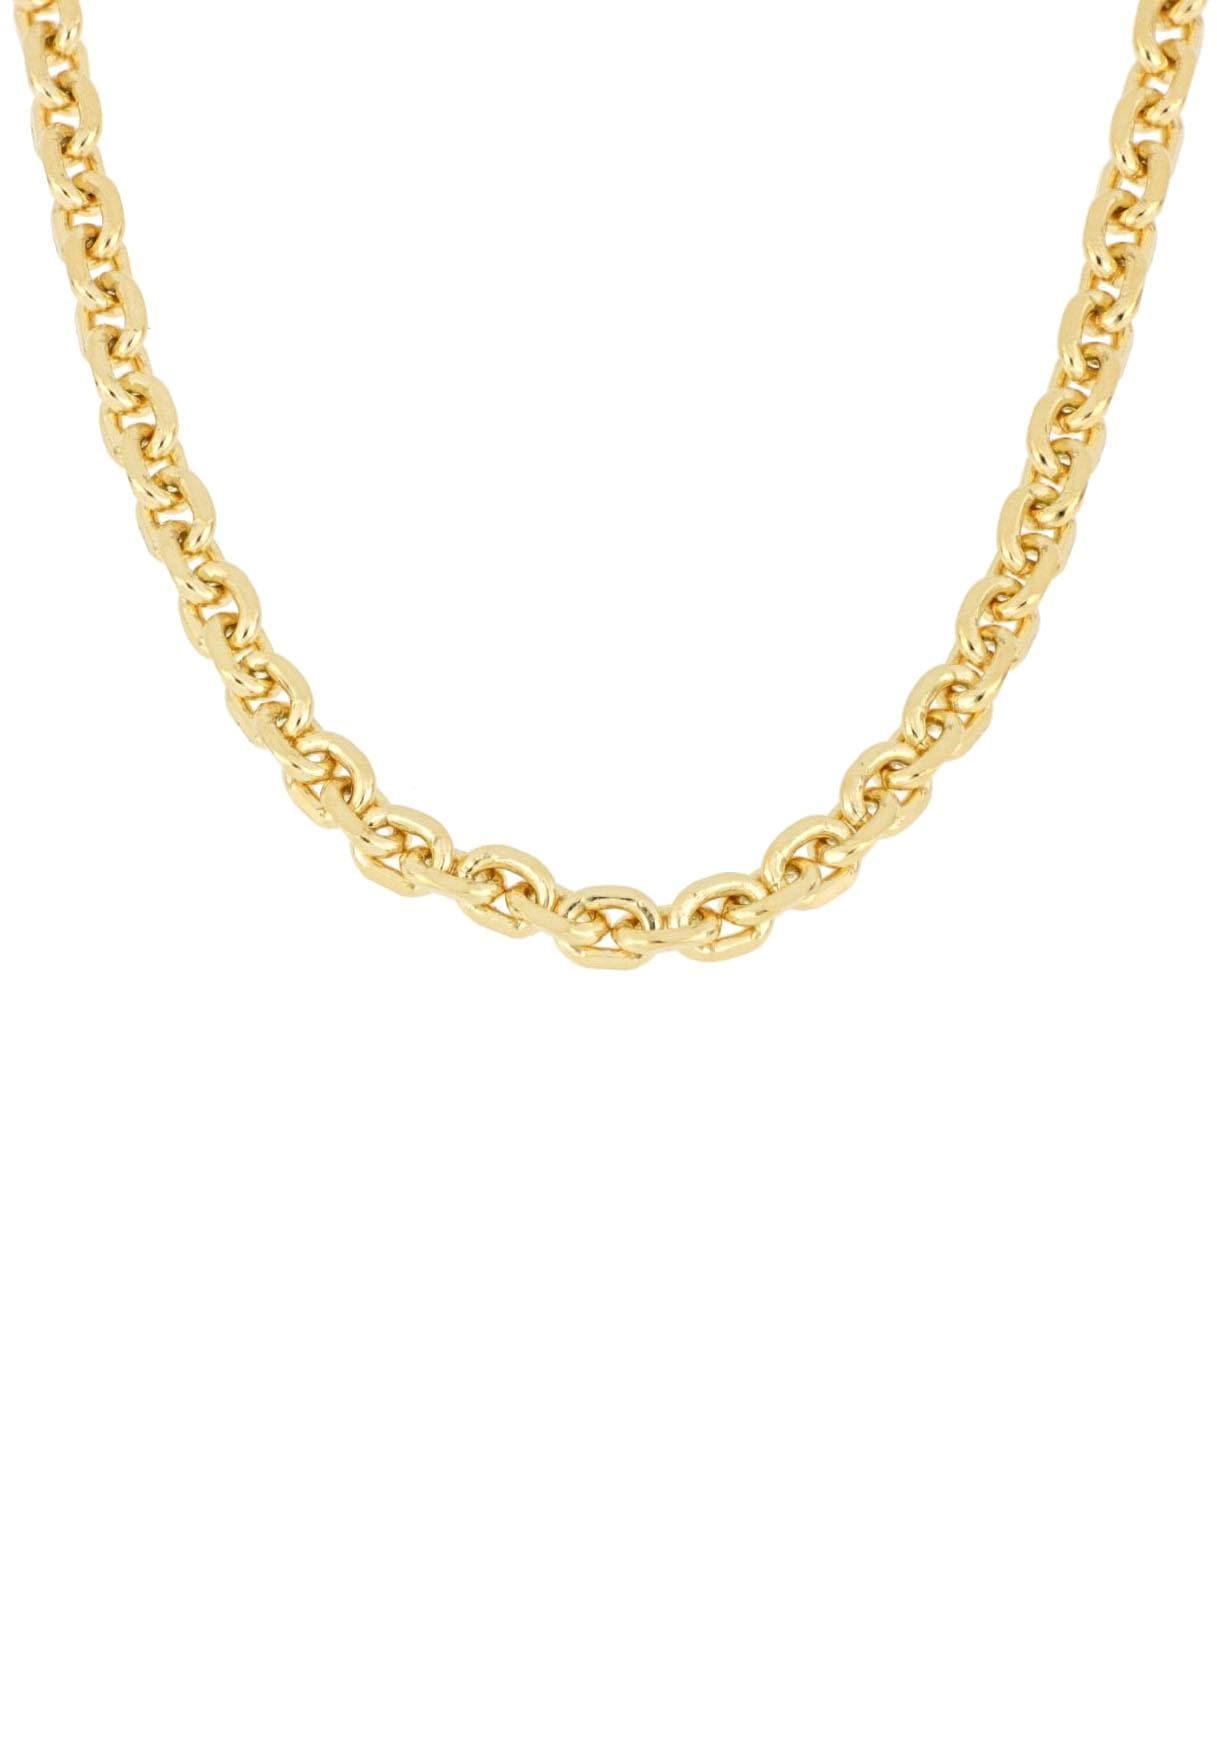 Firetti Gliederkette »Ankerkettengliederung, 4-fach diamantiert« | Schmuck > Halsketten > Gliederketten | FIRETTI